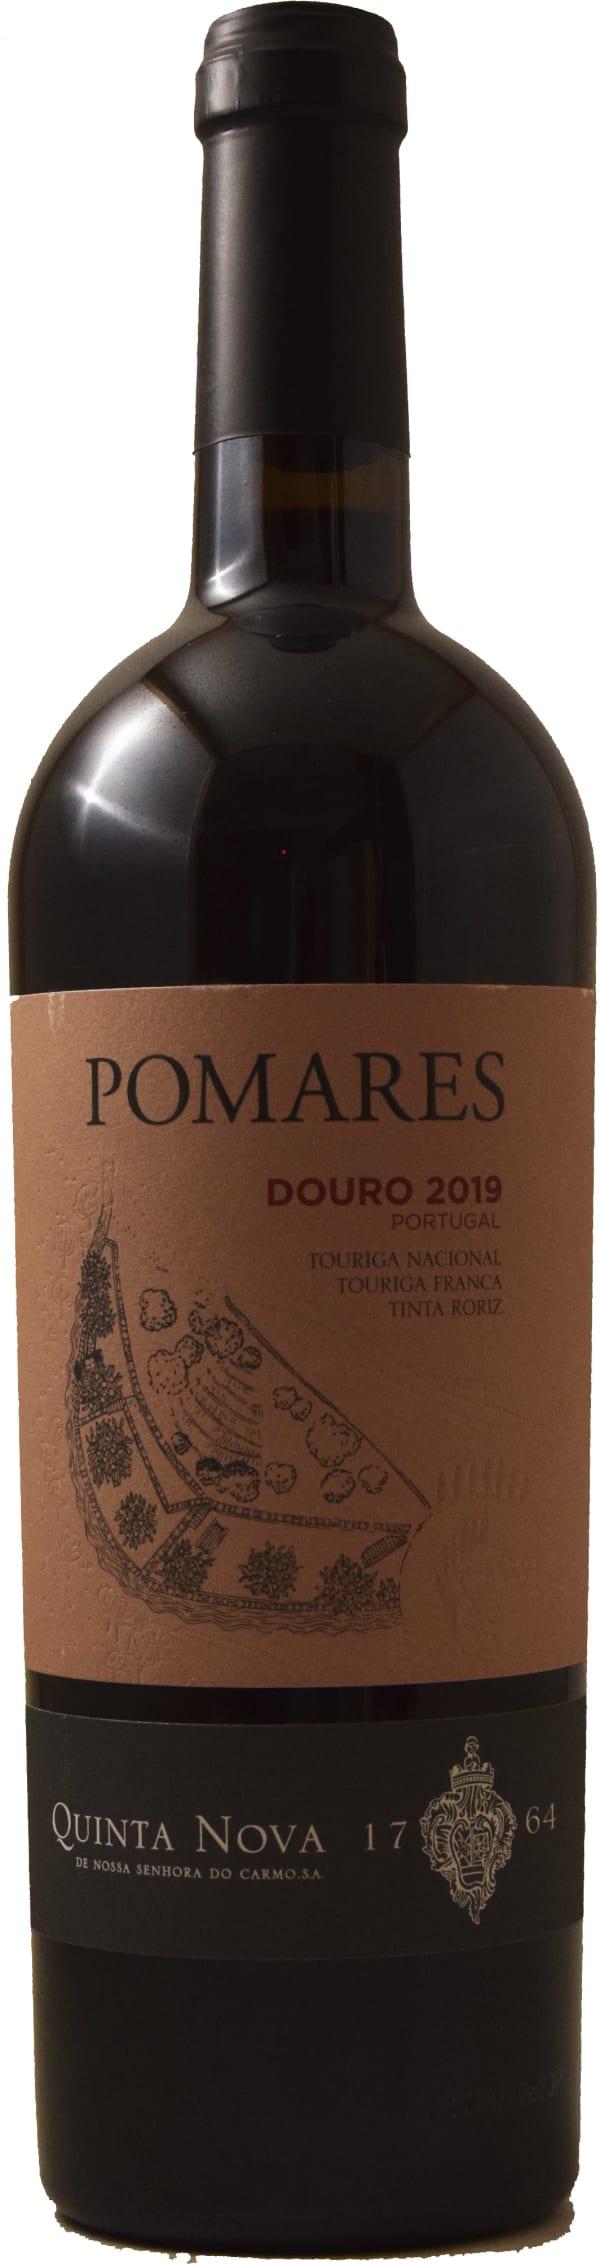 Quinta Nova Pomares 2019